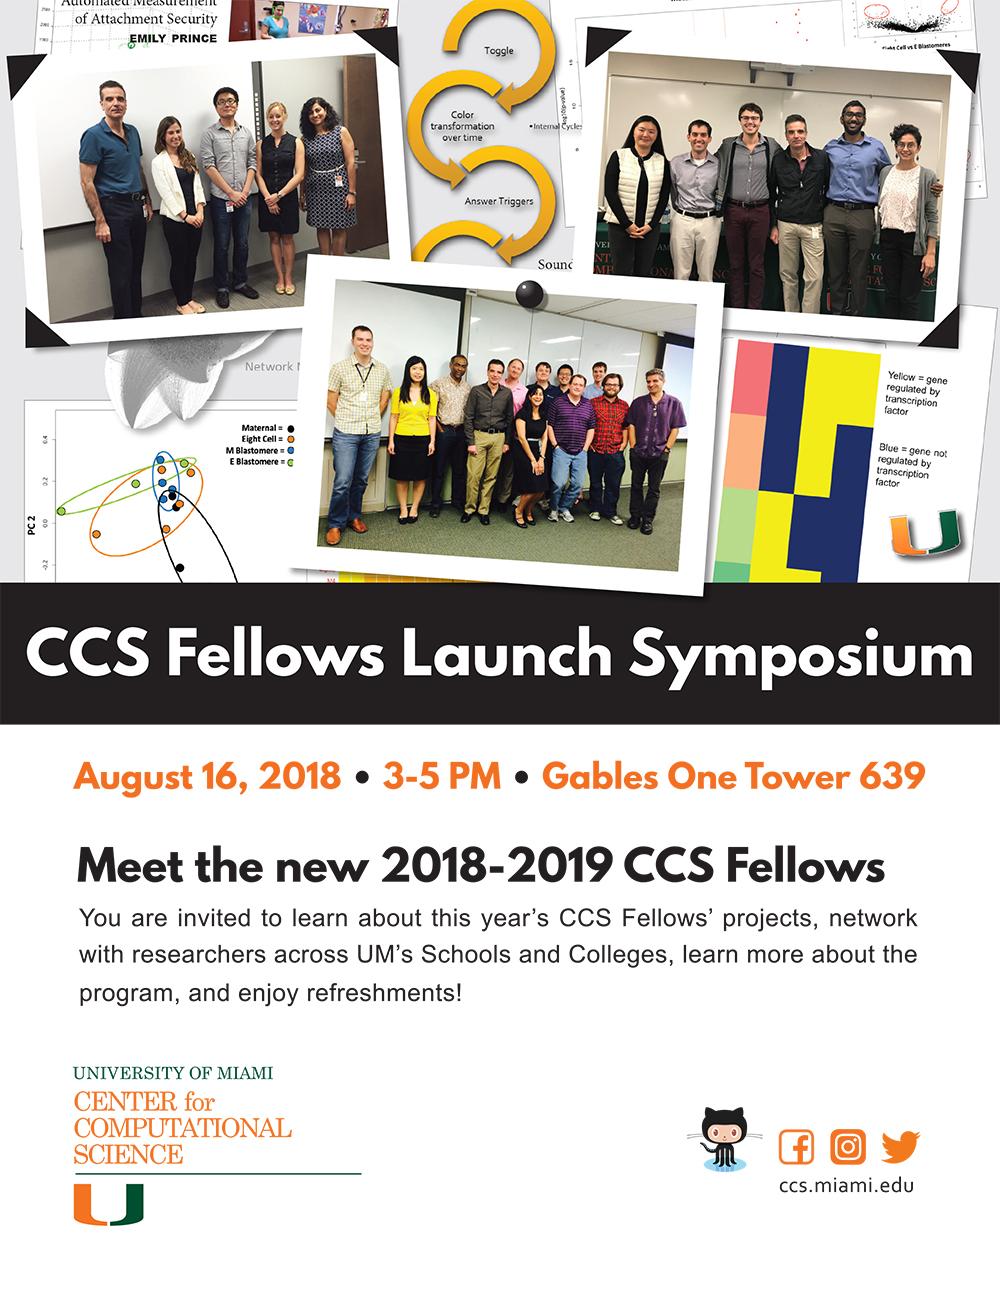 2018-2019 CCS Fellows Launch Symposium Invitation